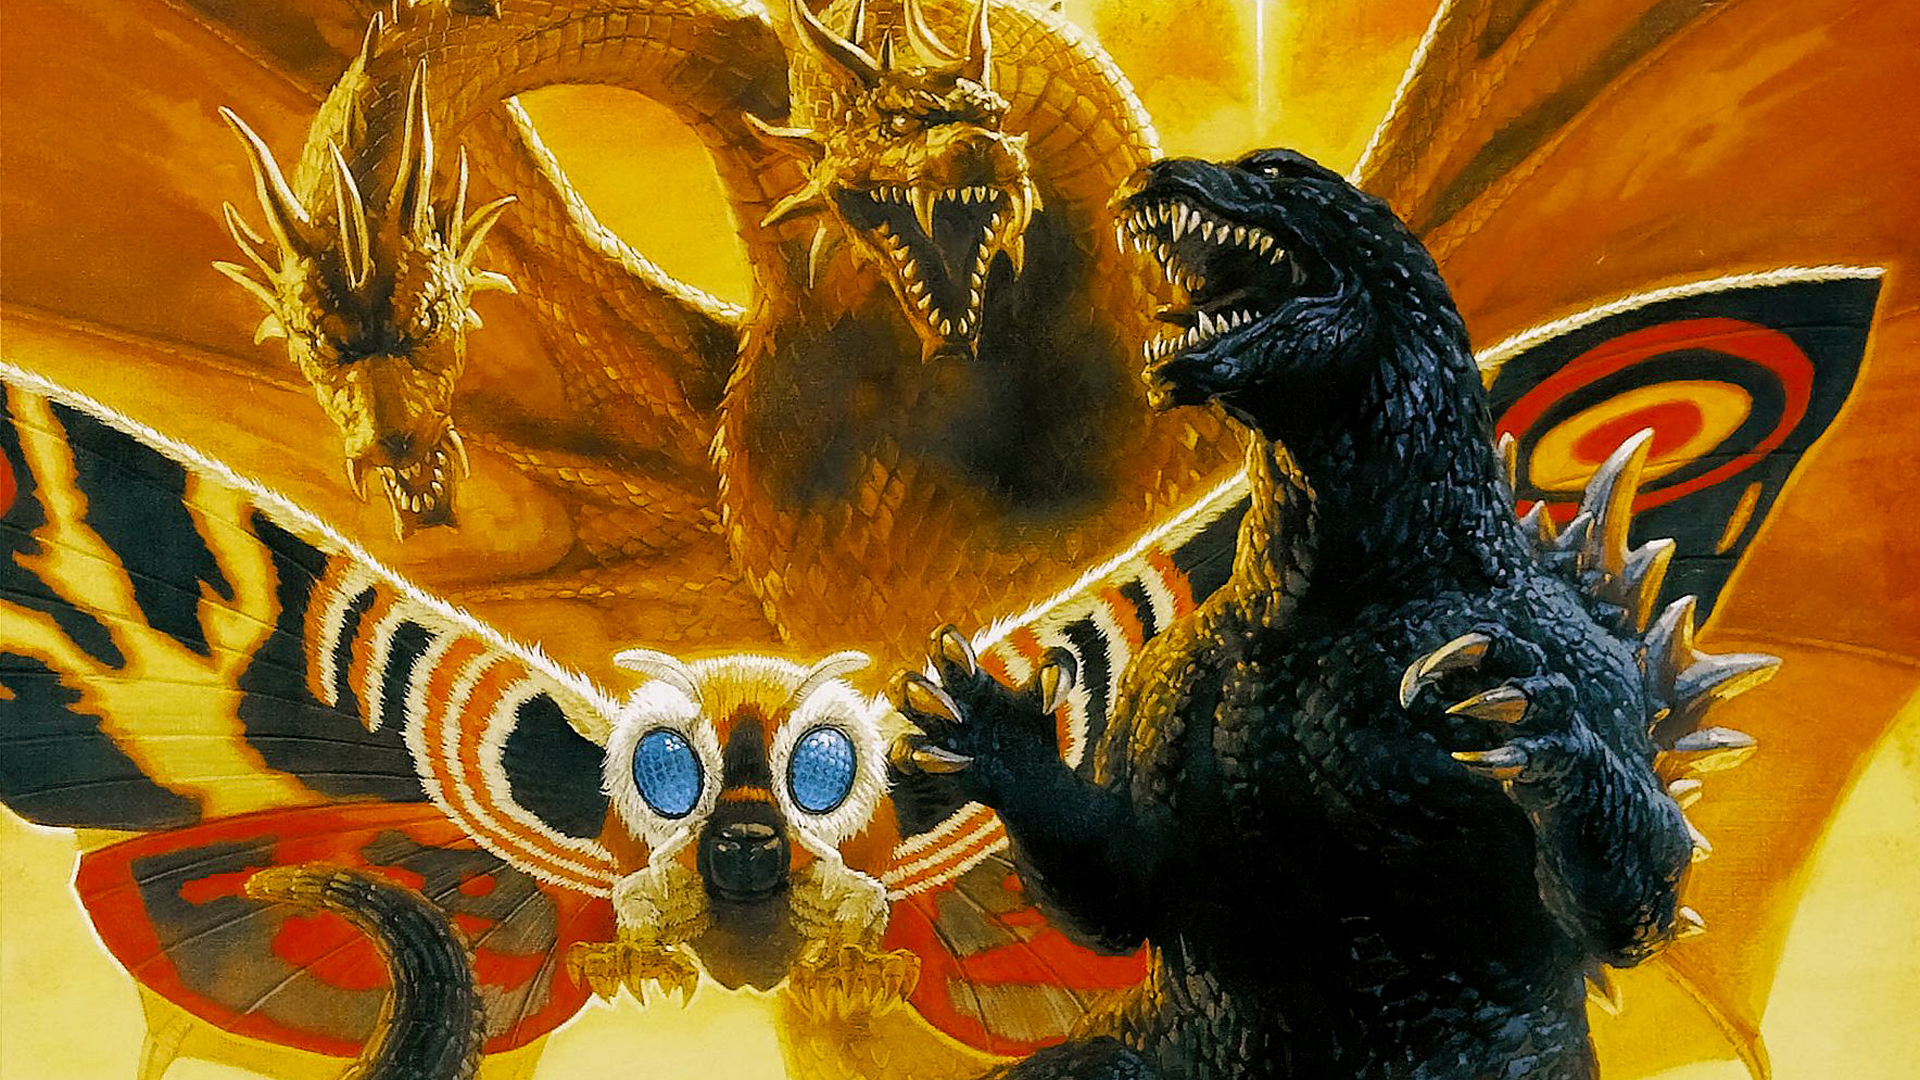 Godzilla Mothra and King Ghidorah Wallpaper   Godzilla Wallpaper 1920x1080